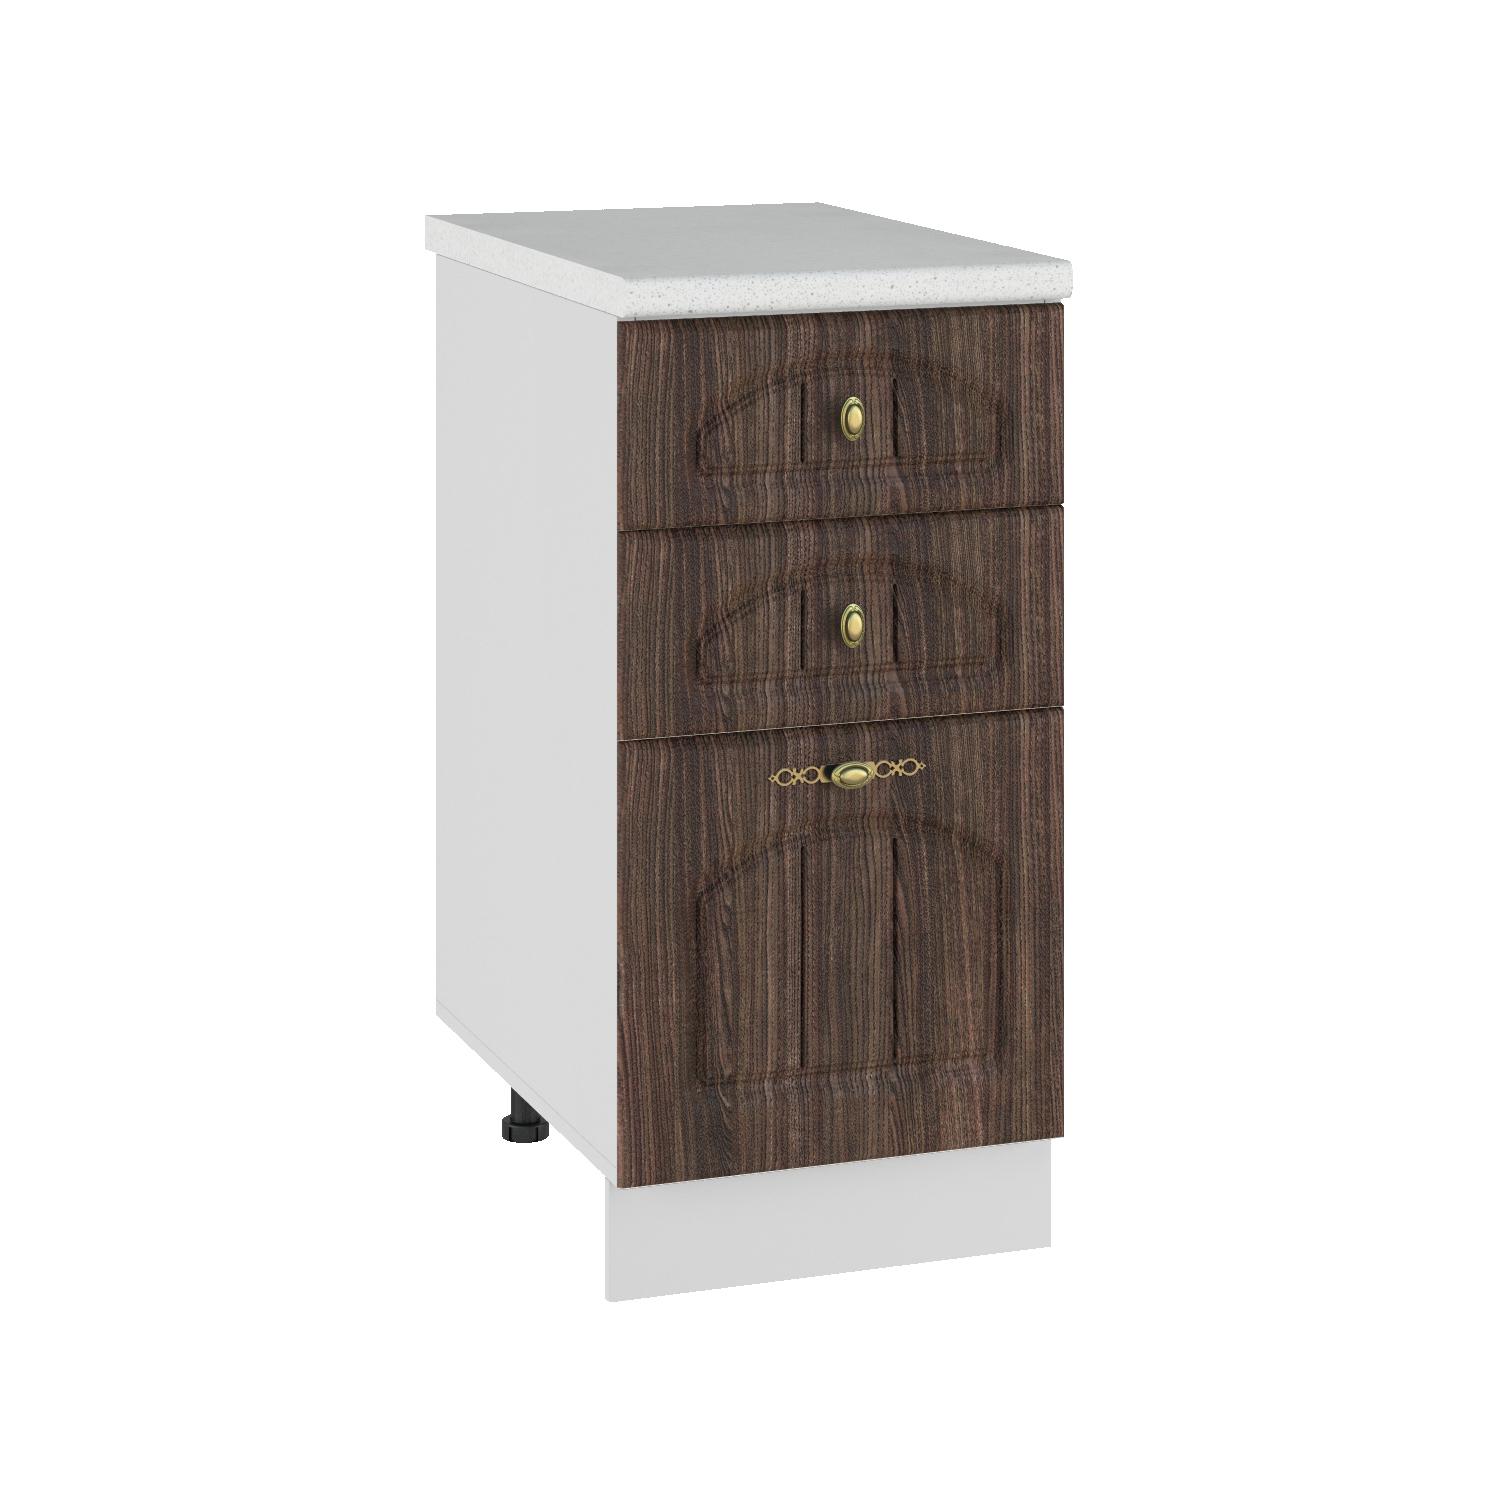 Кухня Монако СЯ 400 Шкаф нижний с ящиками